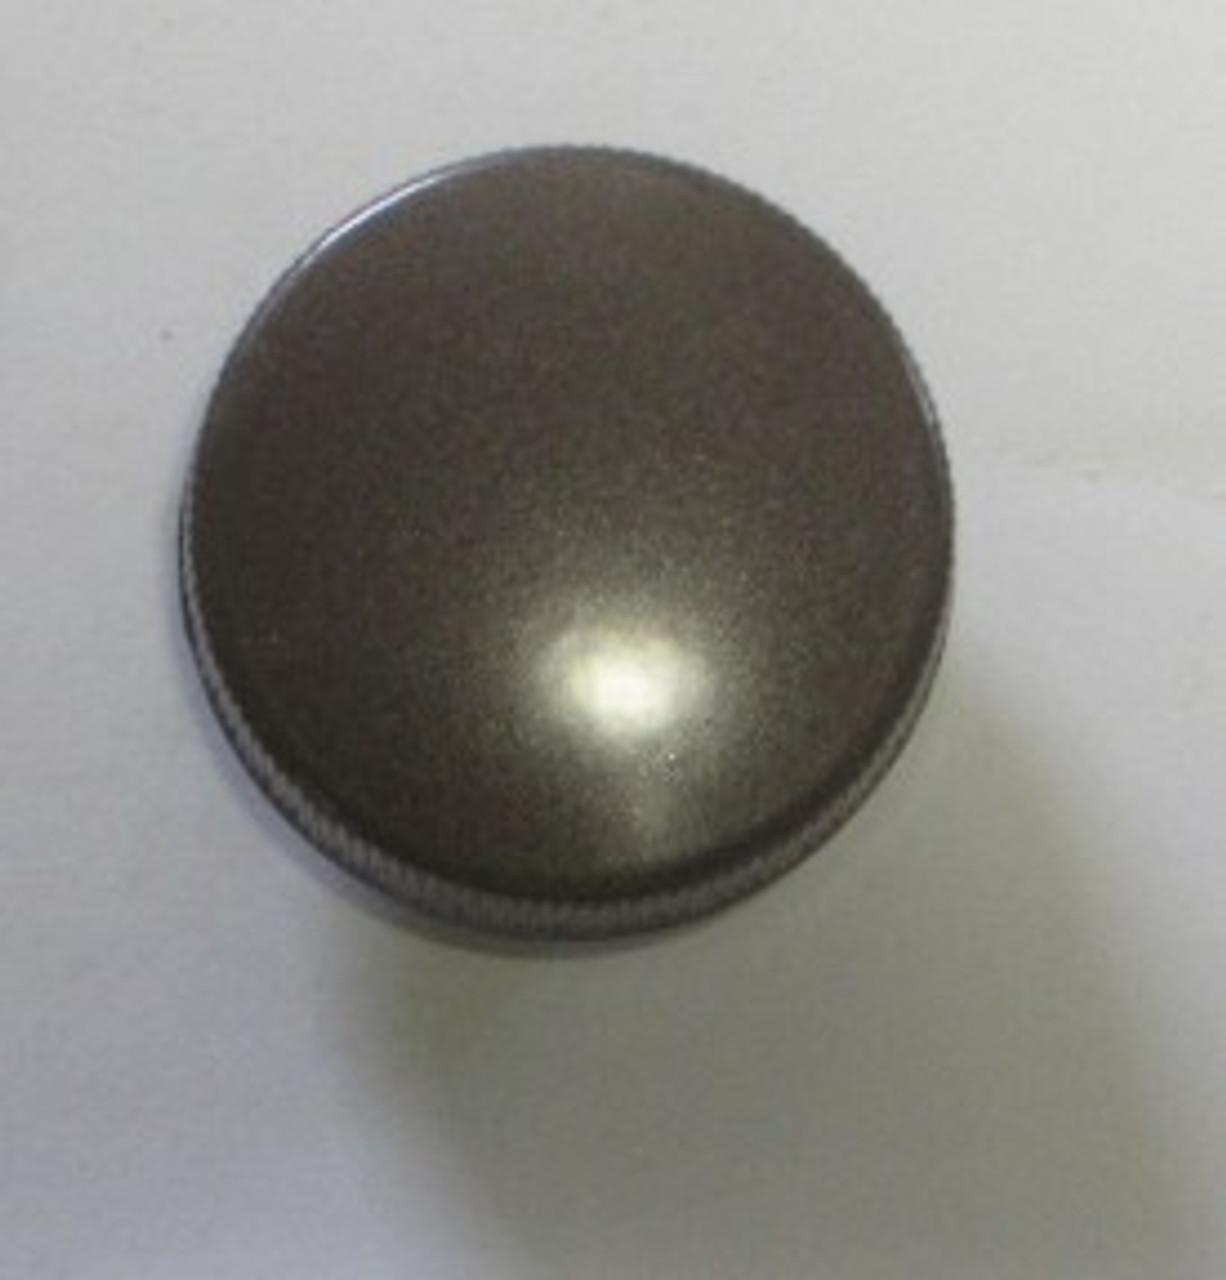 handle round knob (mirage) fits casement from 1980 through 8/8/05